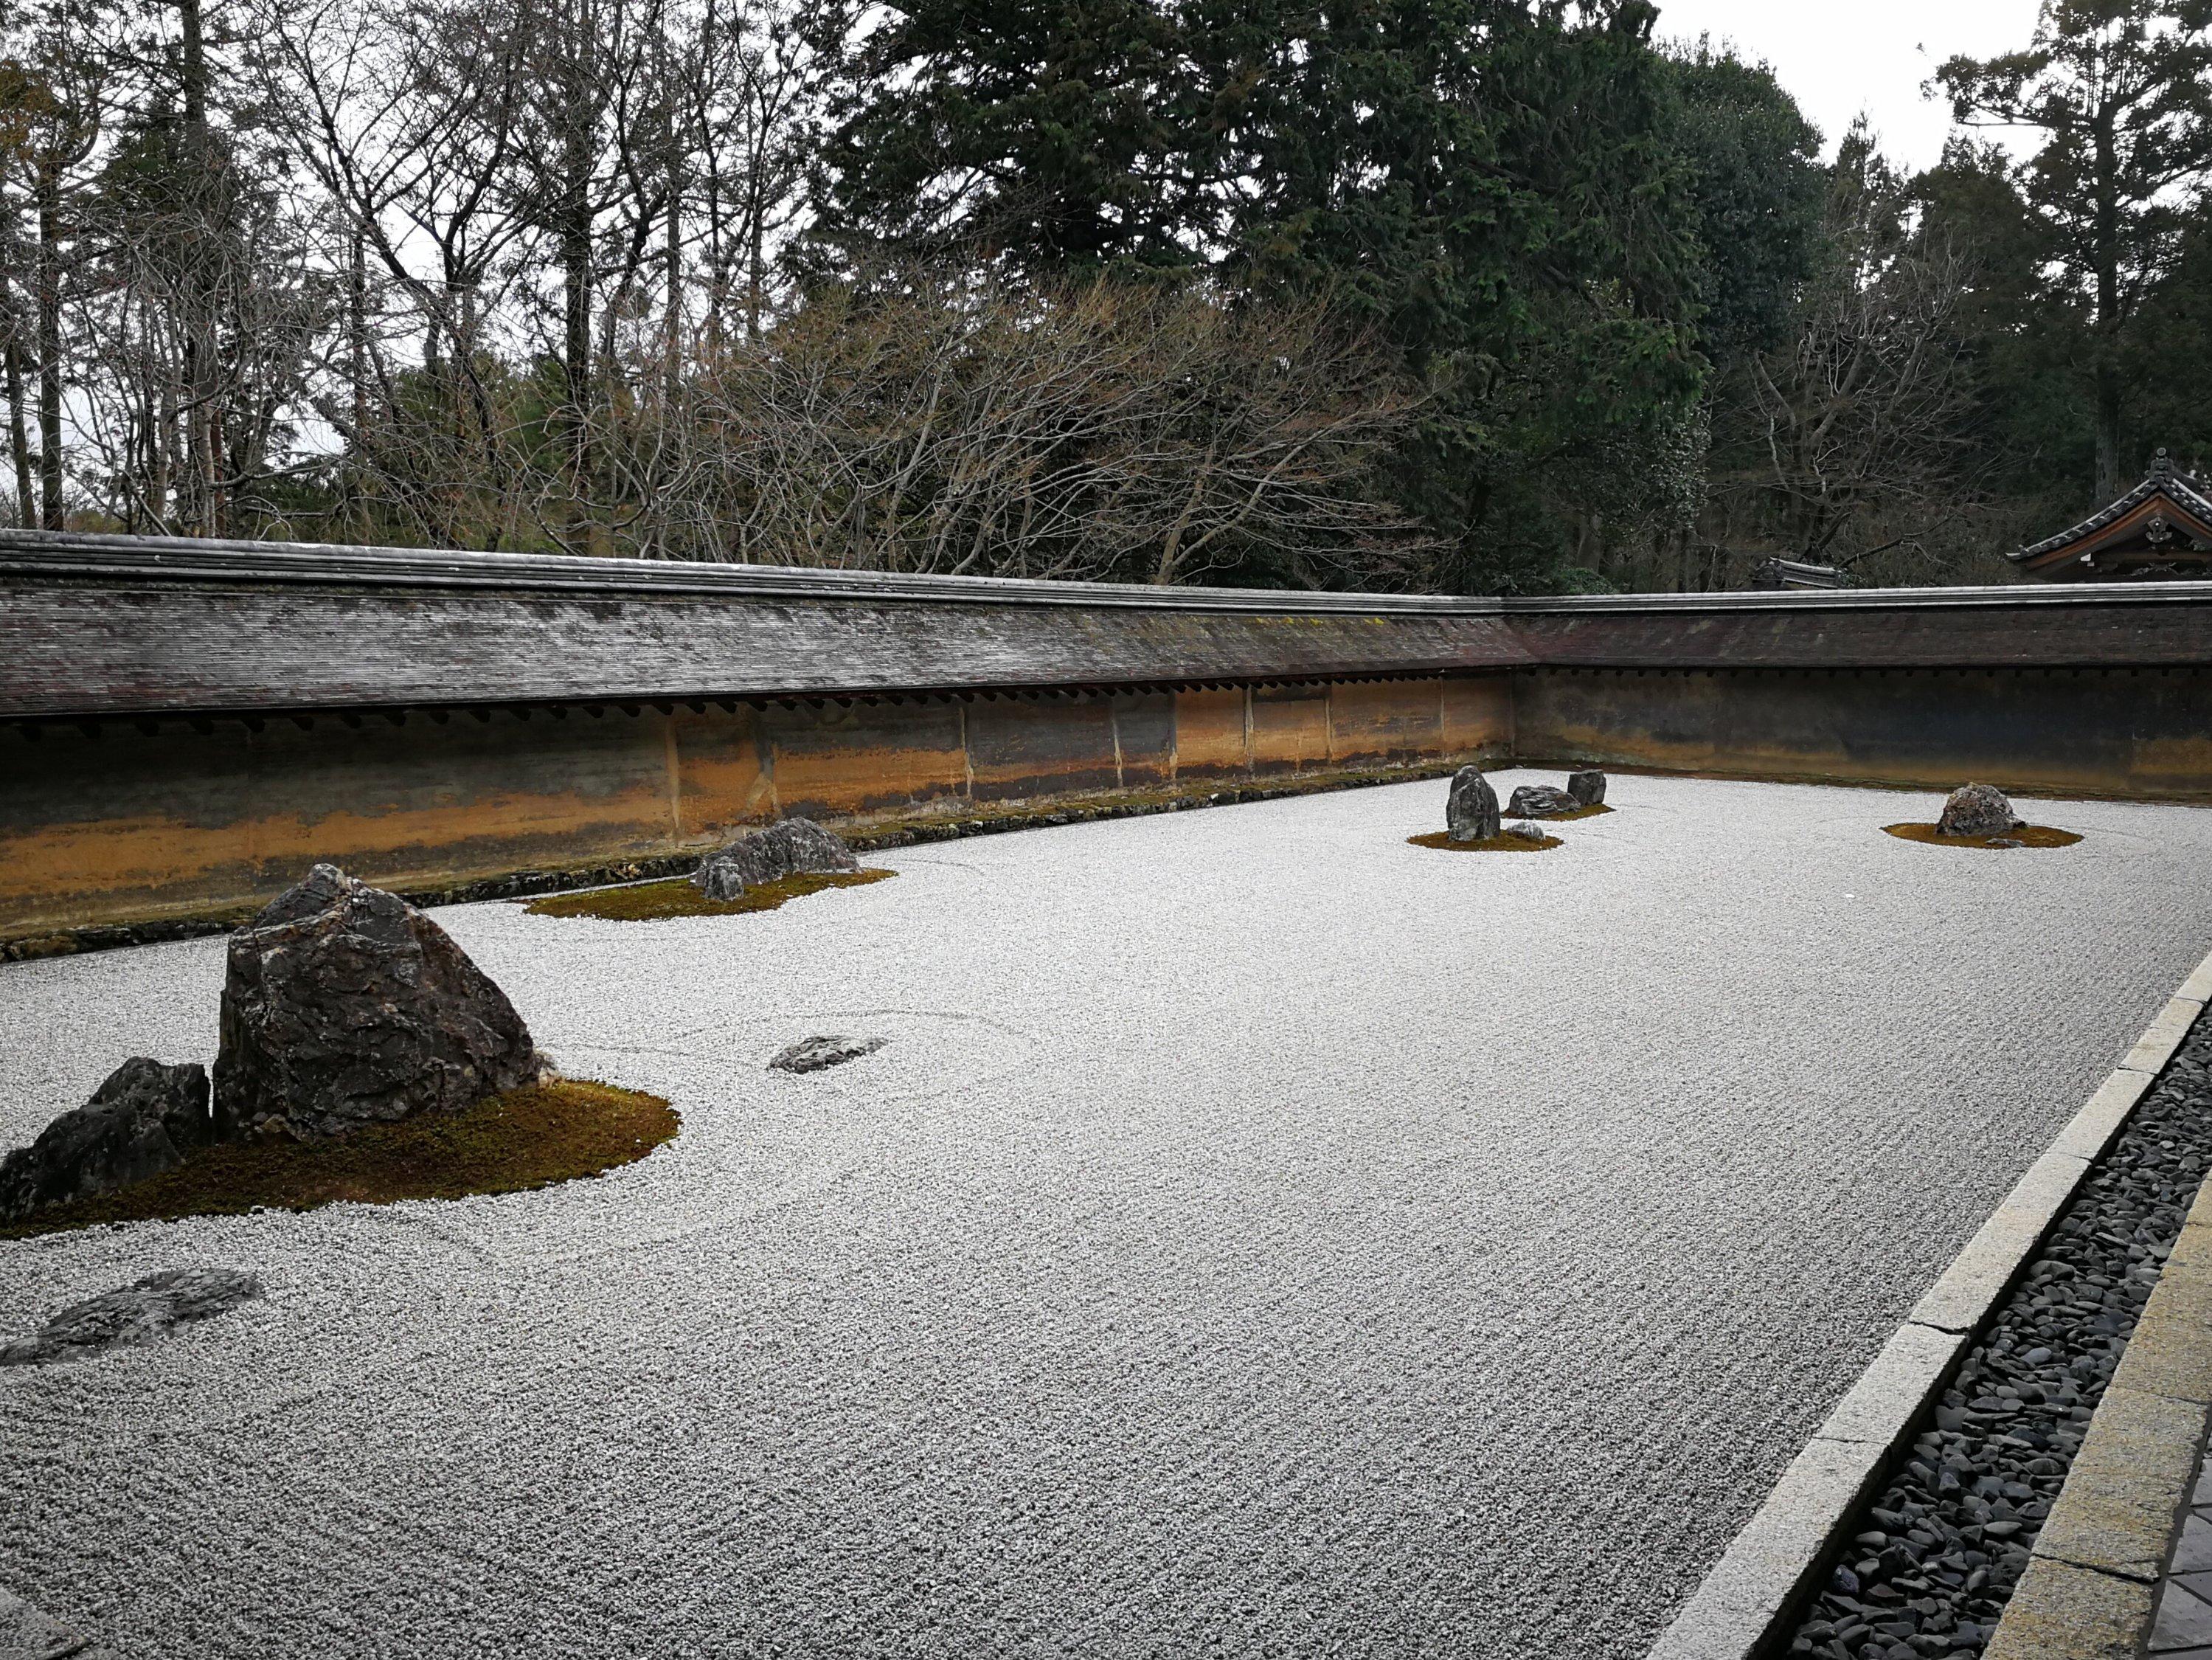 giardino del Ryoan-ji temple - Kyoto 4 giorni